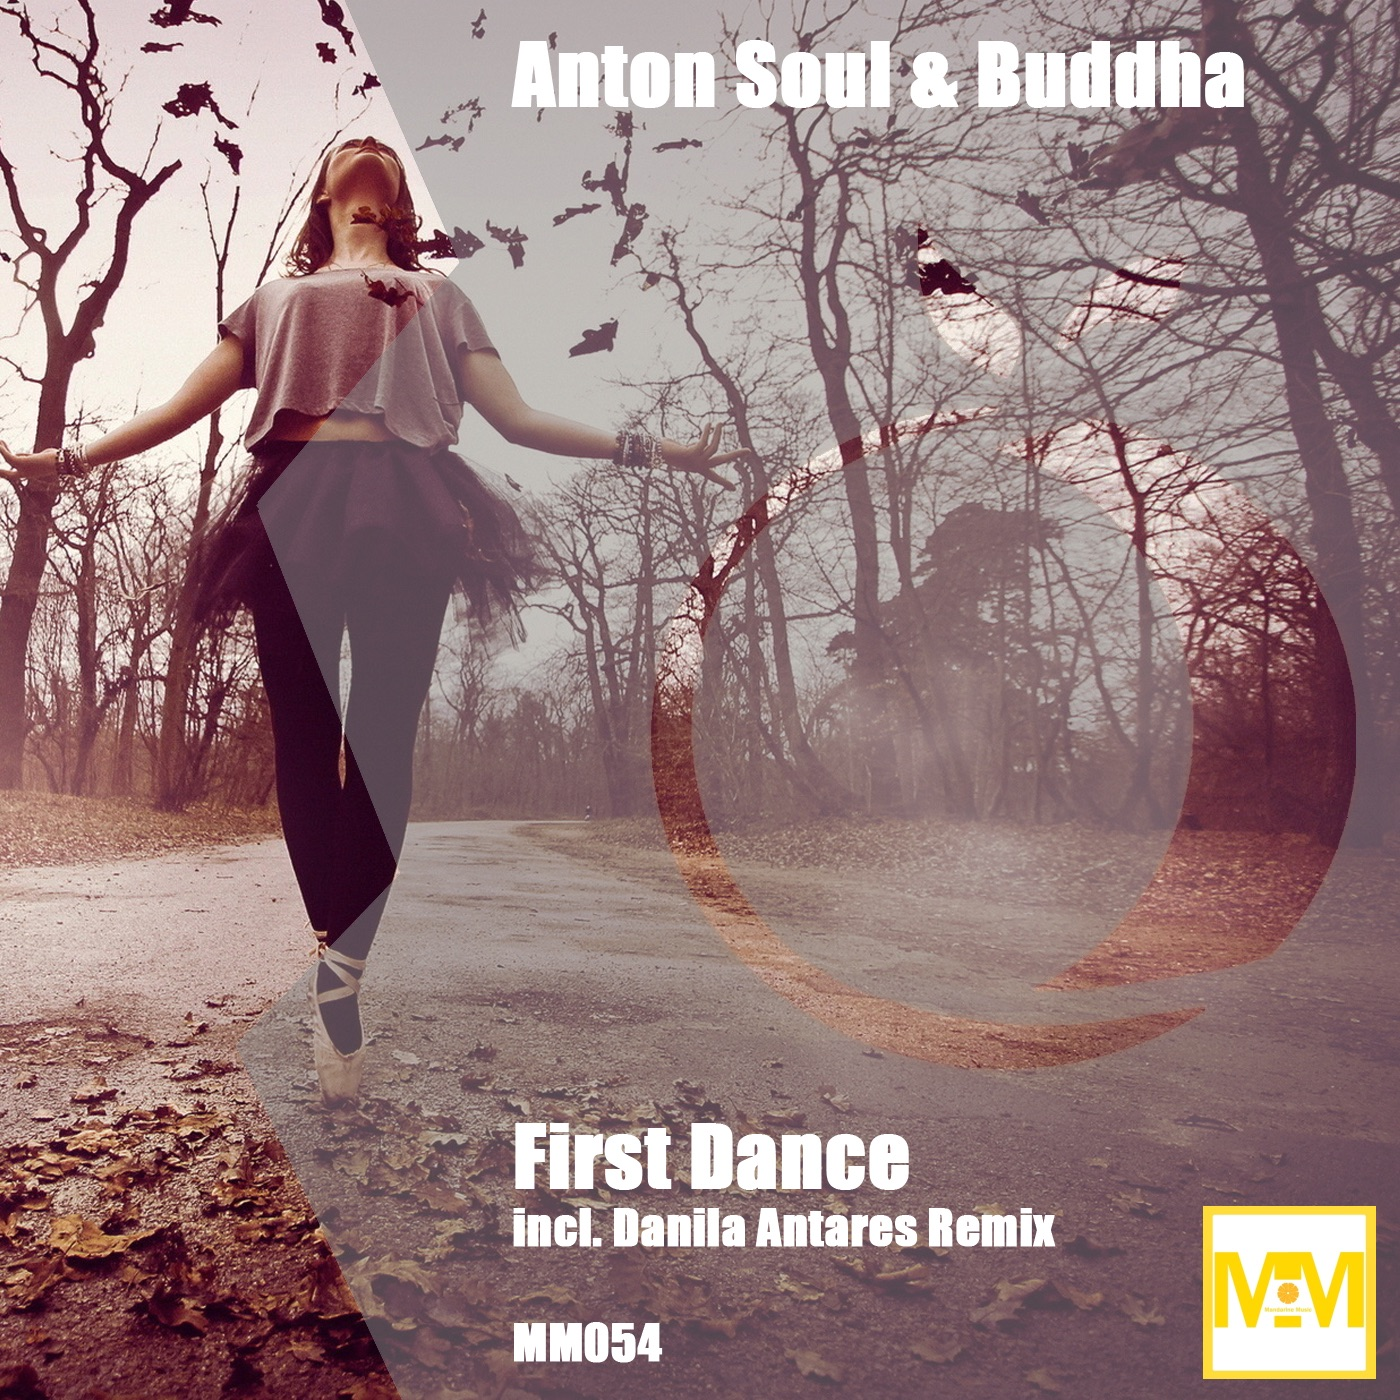 First Dance - Single